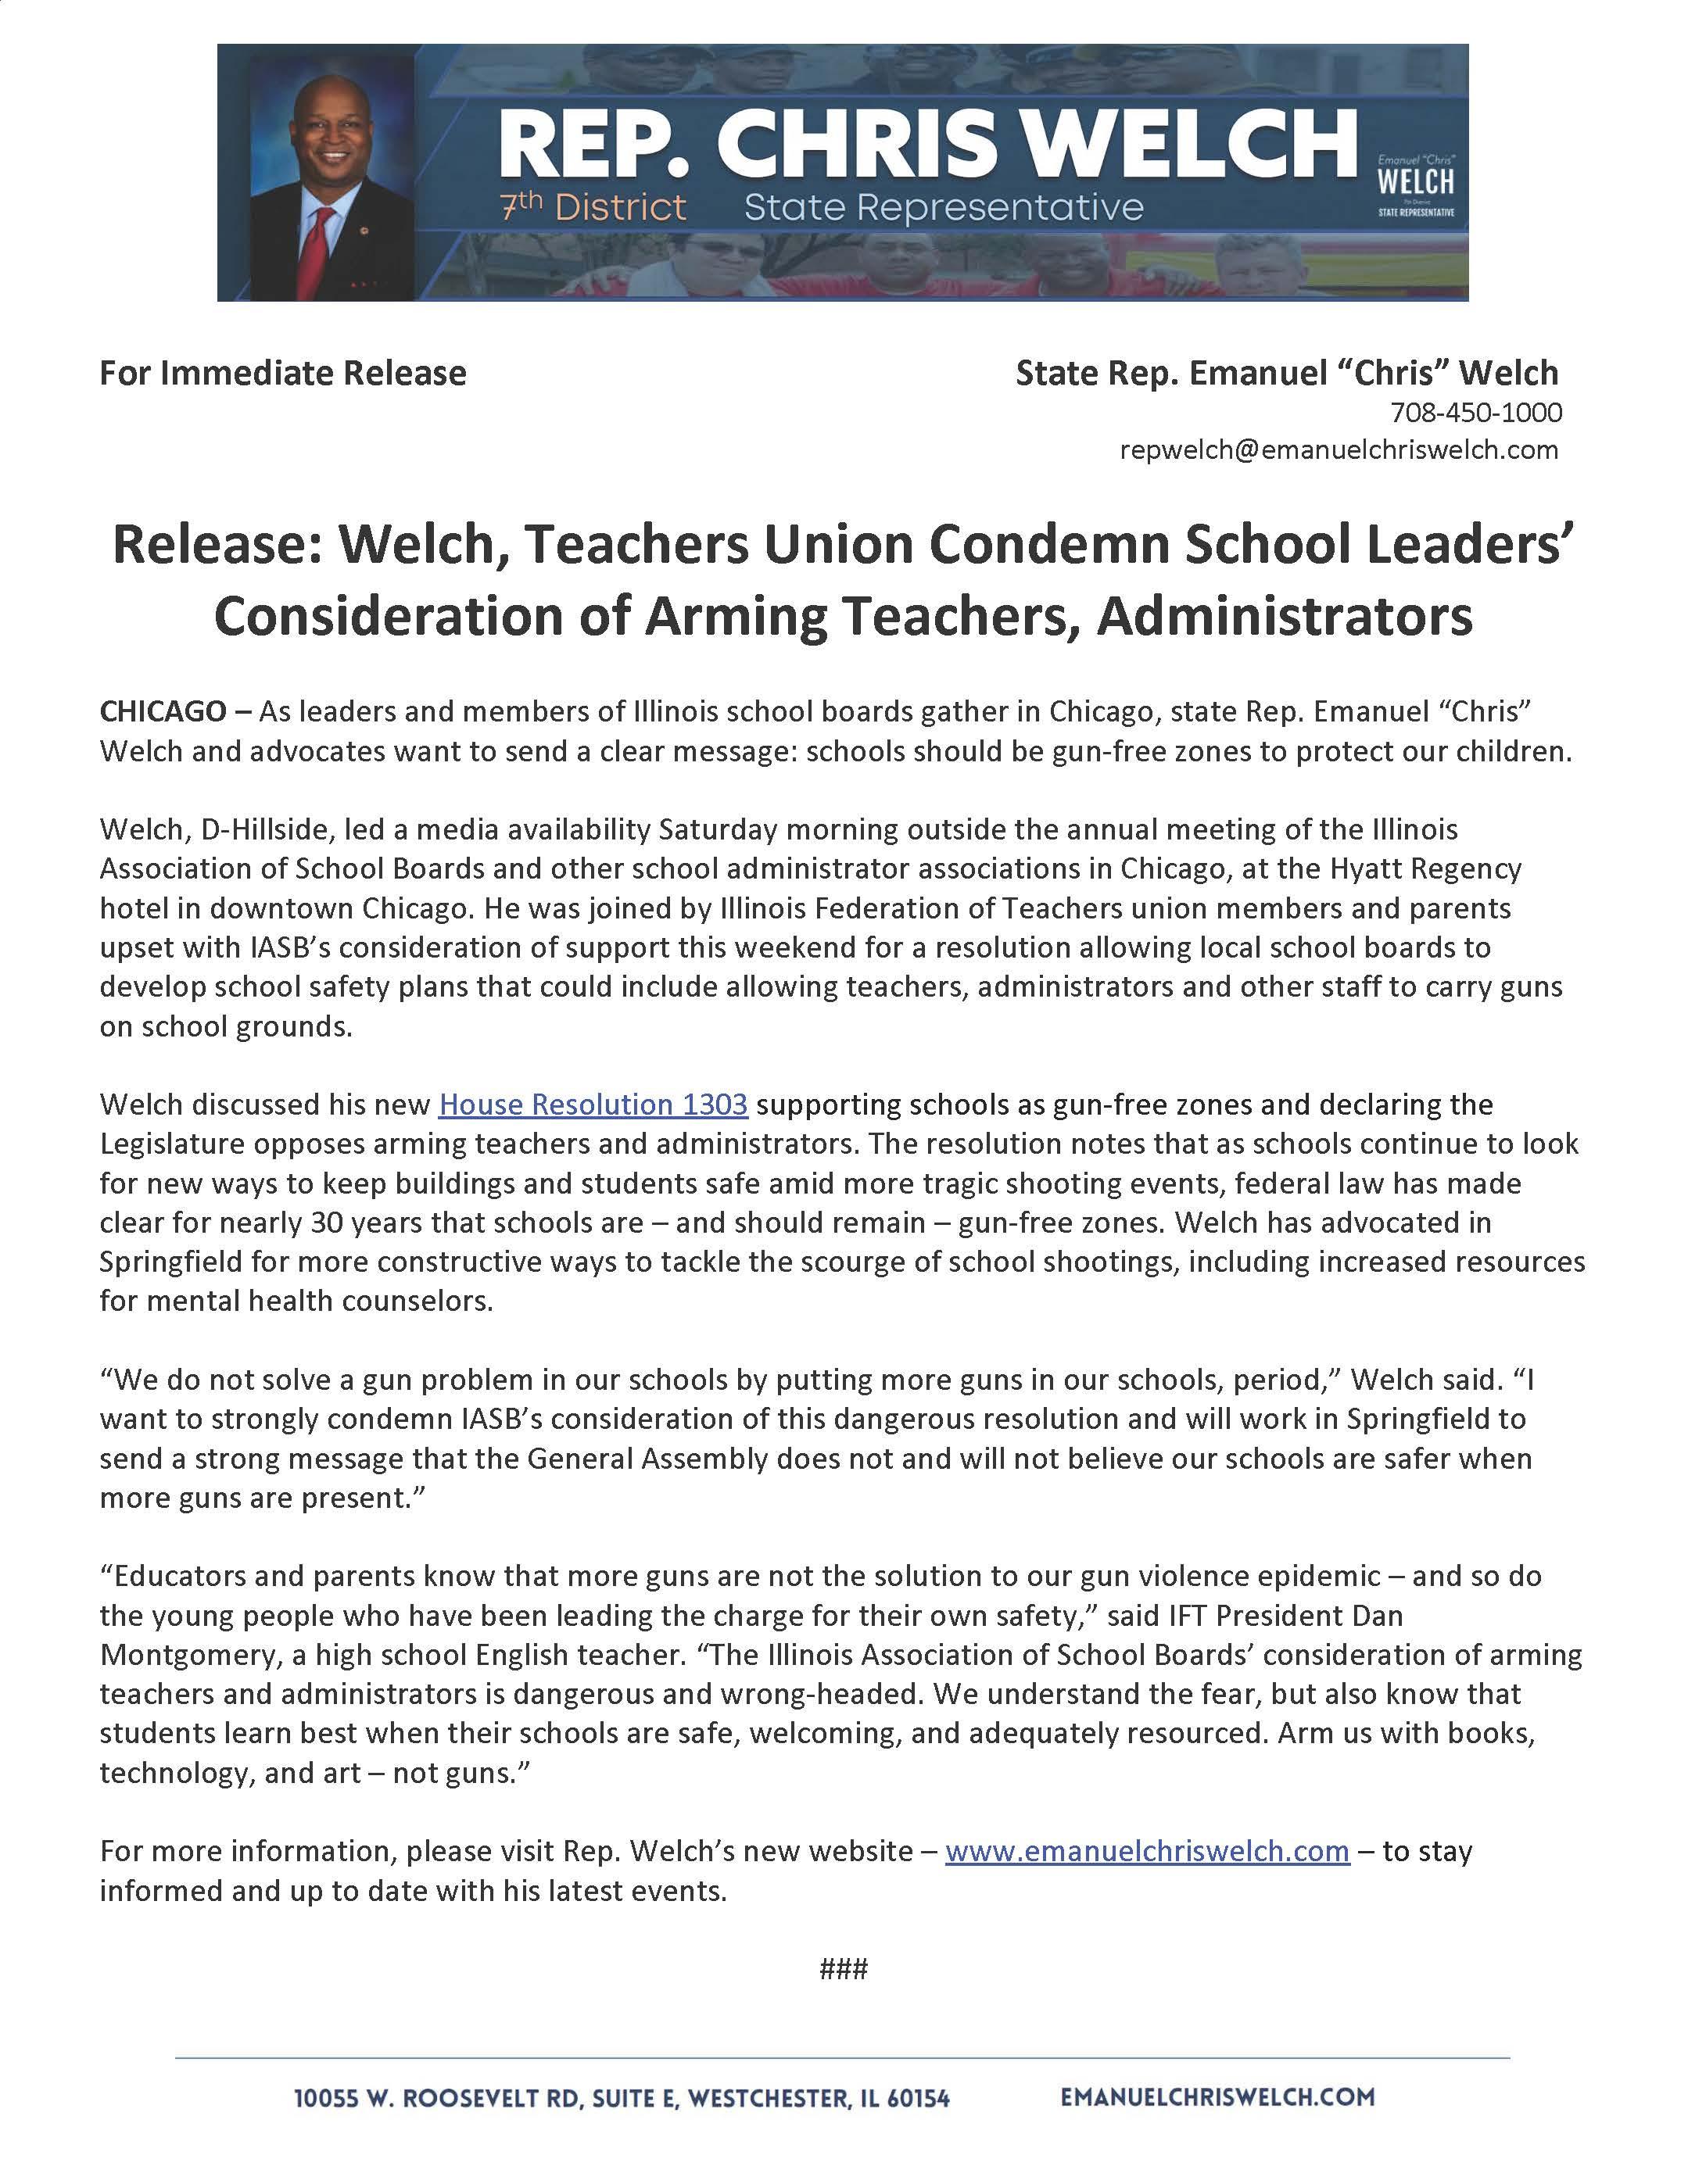 Welch, Teachers Union Condemn School Leaders' Consideration of Arming Teachers, Administrators  (November 17, 2018)